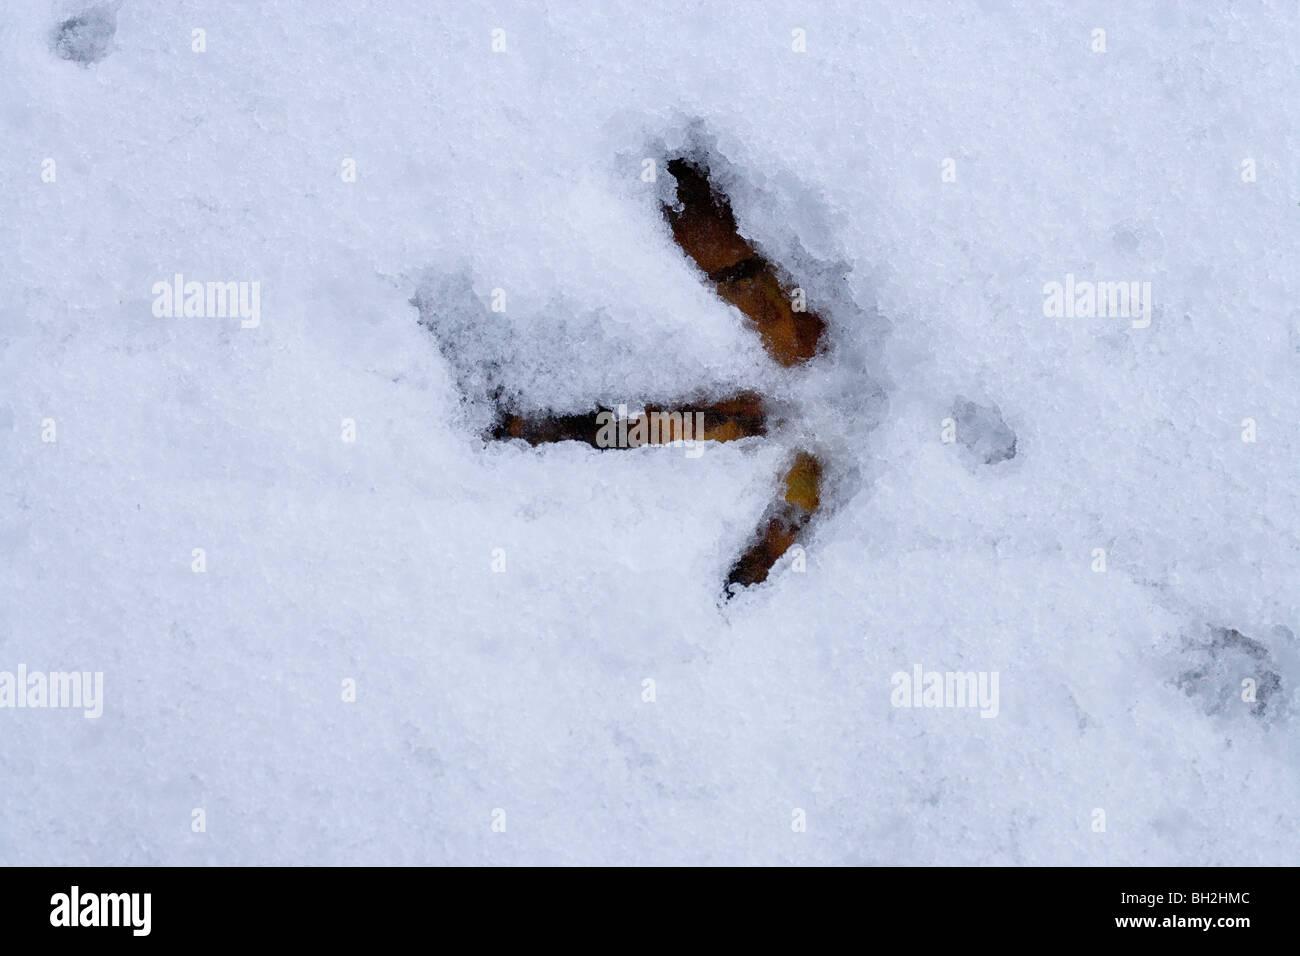 Pheasant (Phasianus colchicus). Left foot print in melting snow. - Stock Image